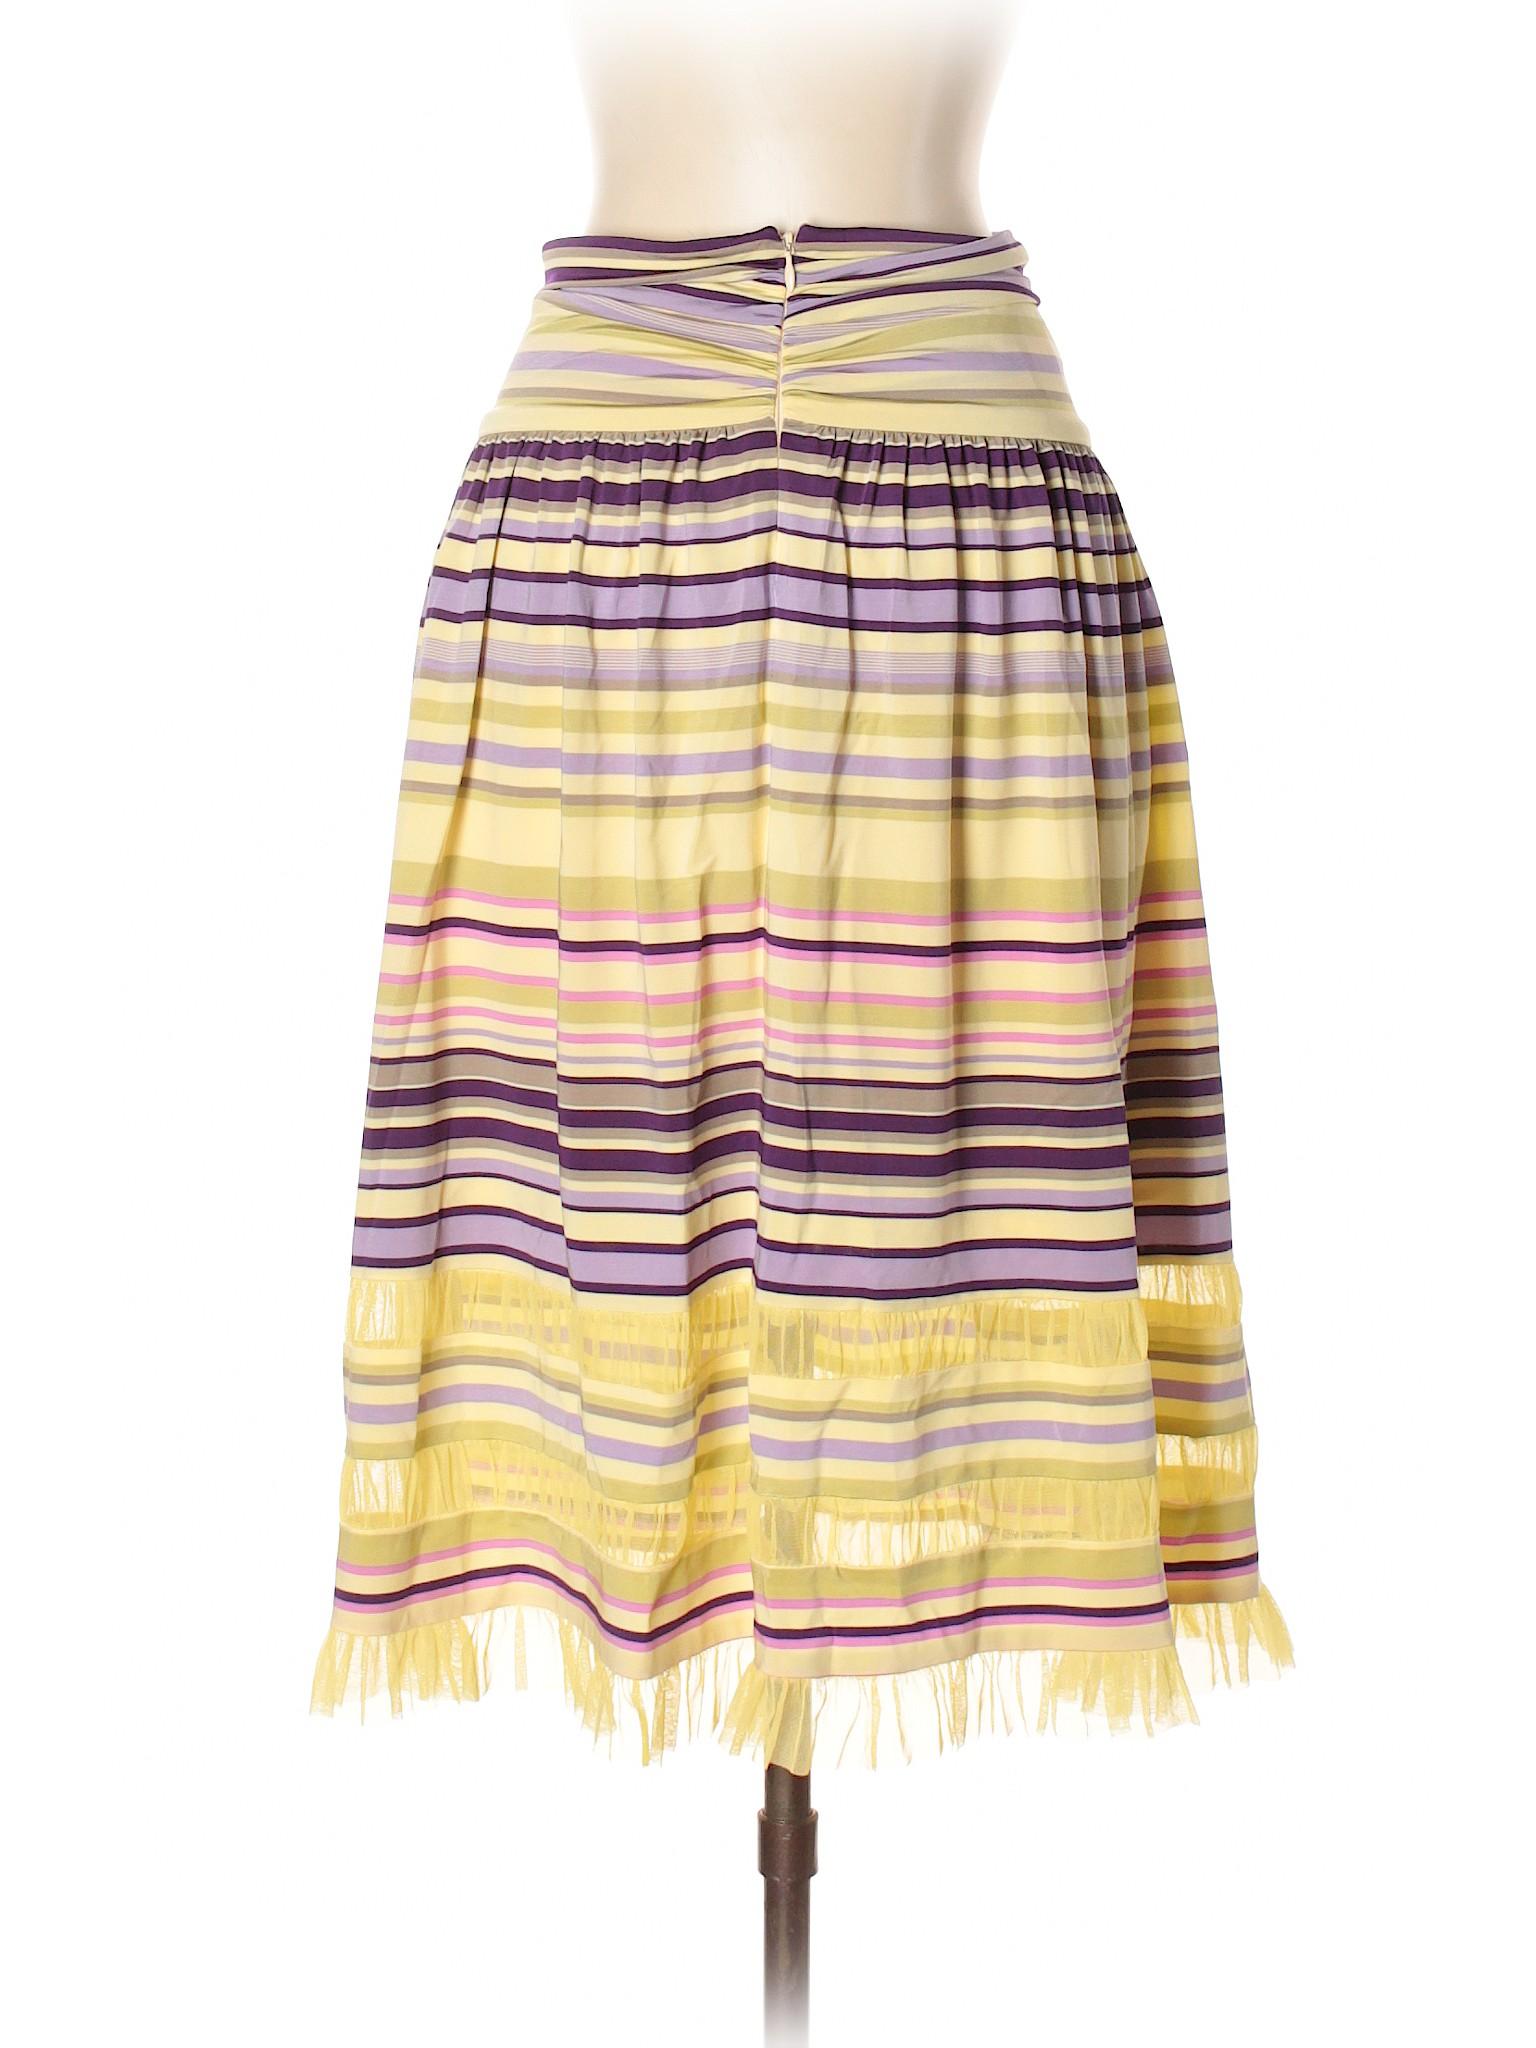 Boutique Casual Casual Skirt Skirt Boutique Casual Boutique Casual Boutique Skirt rqrn1x5